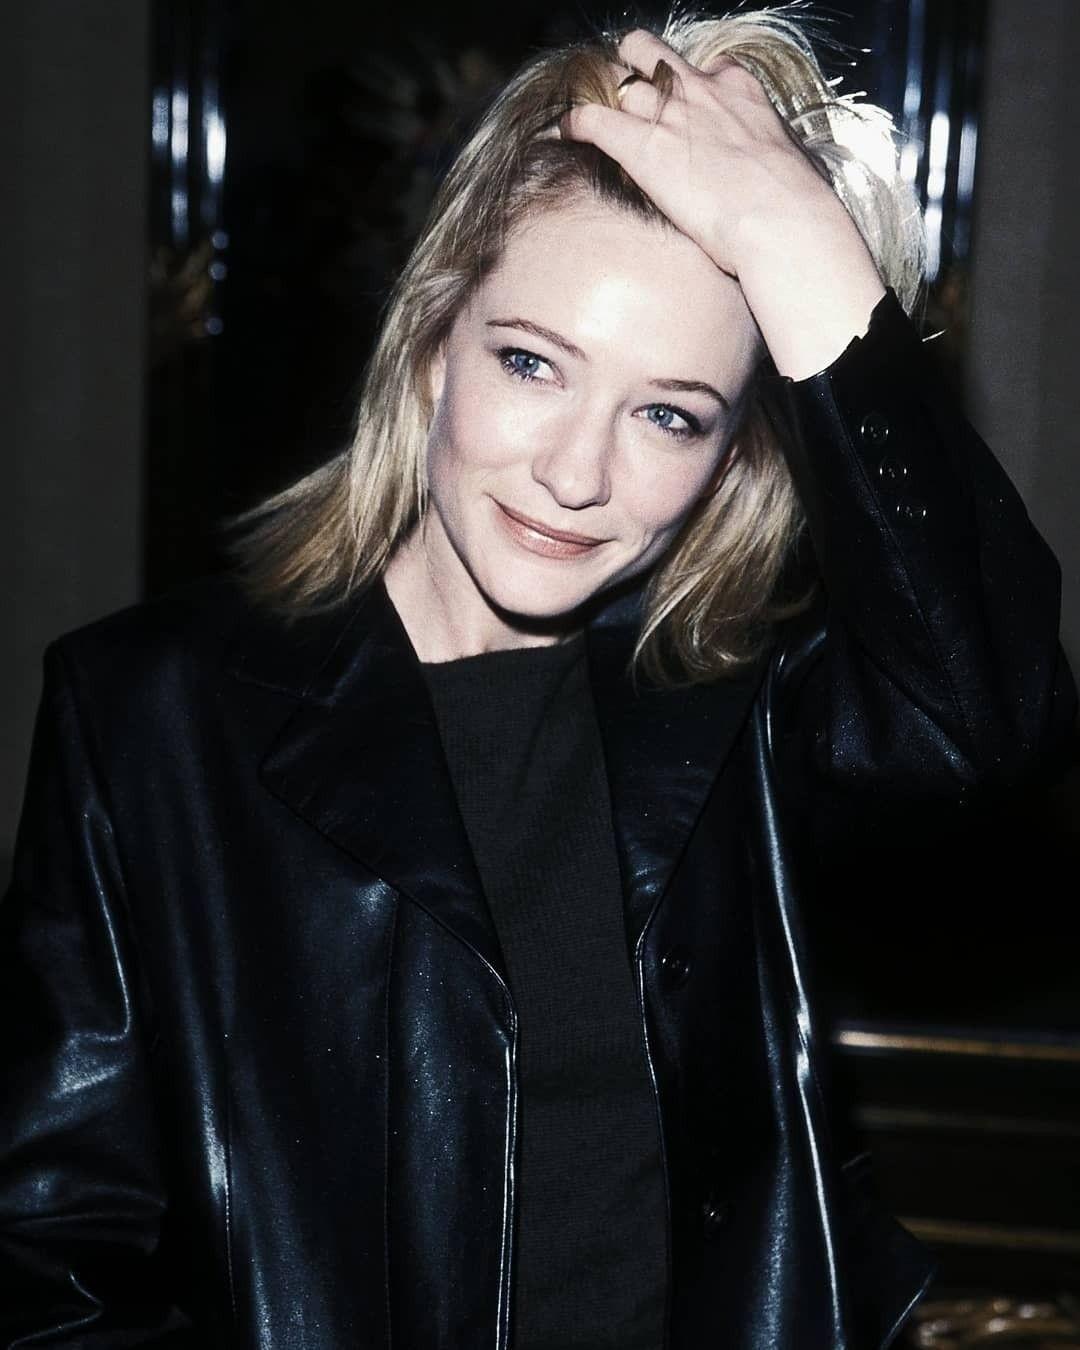 Cate Blanchett Cate blanchett young, Cate blanchett